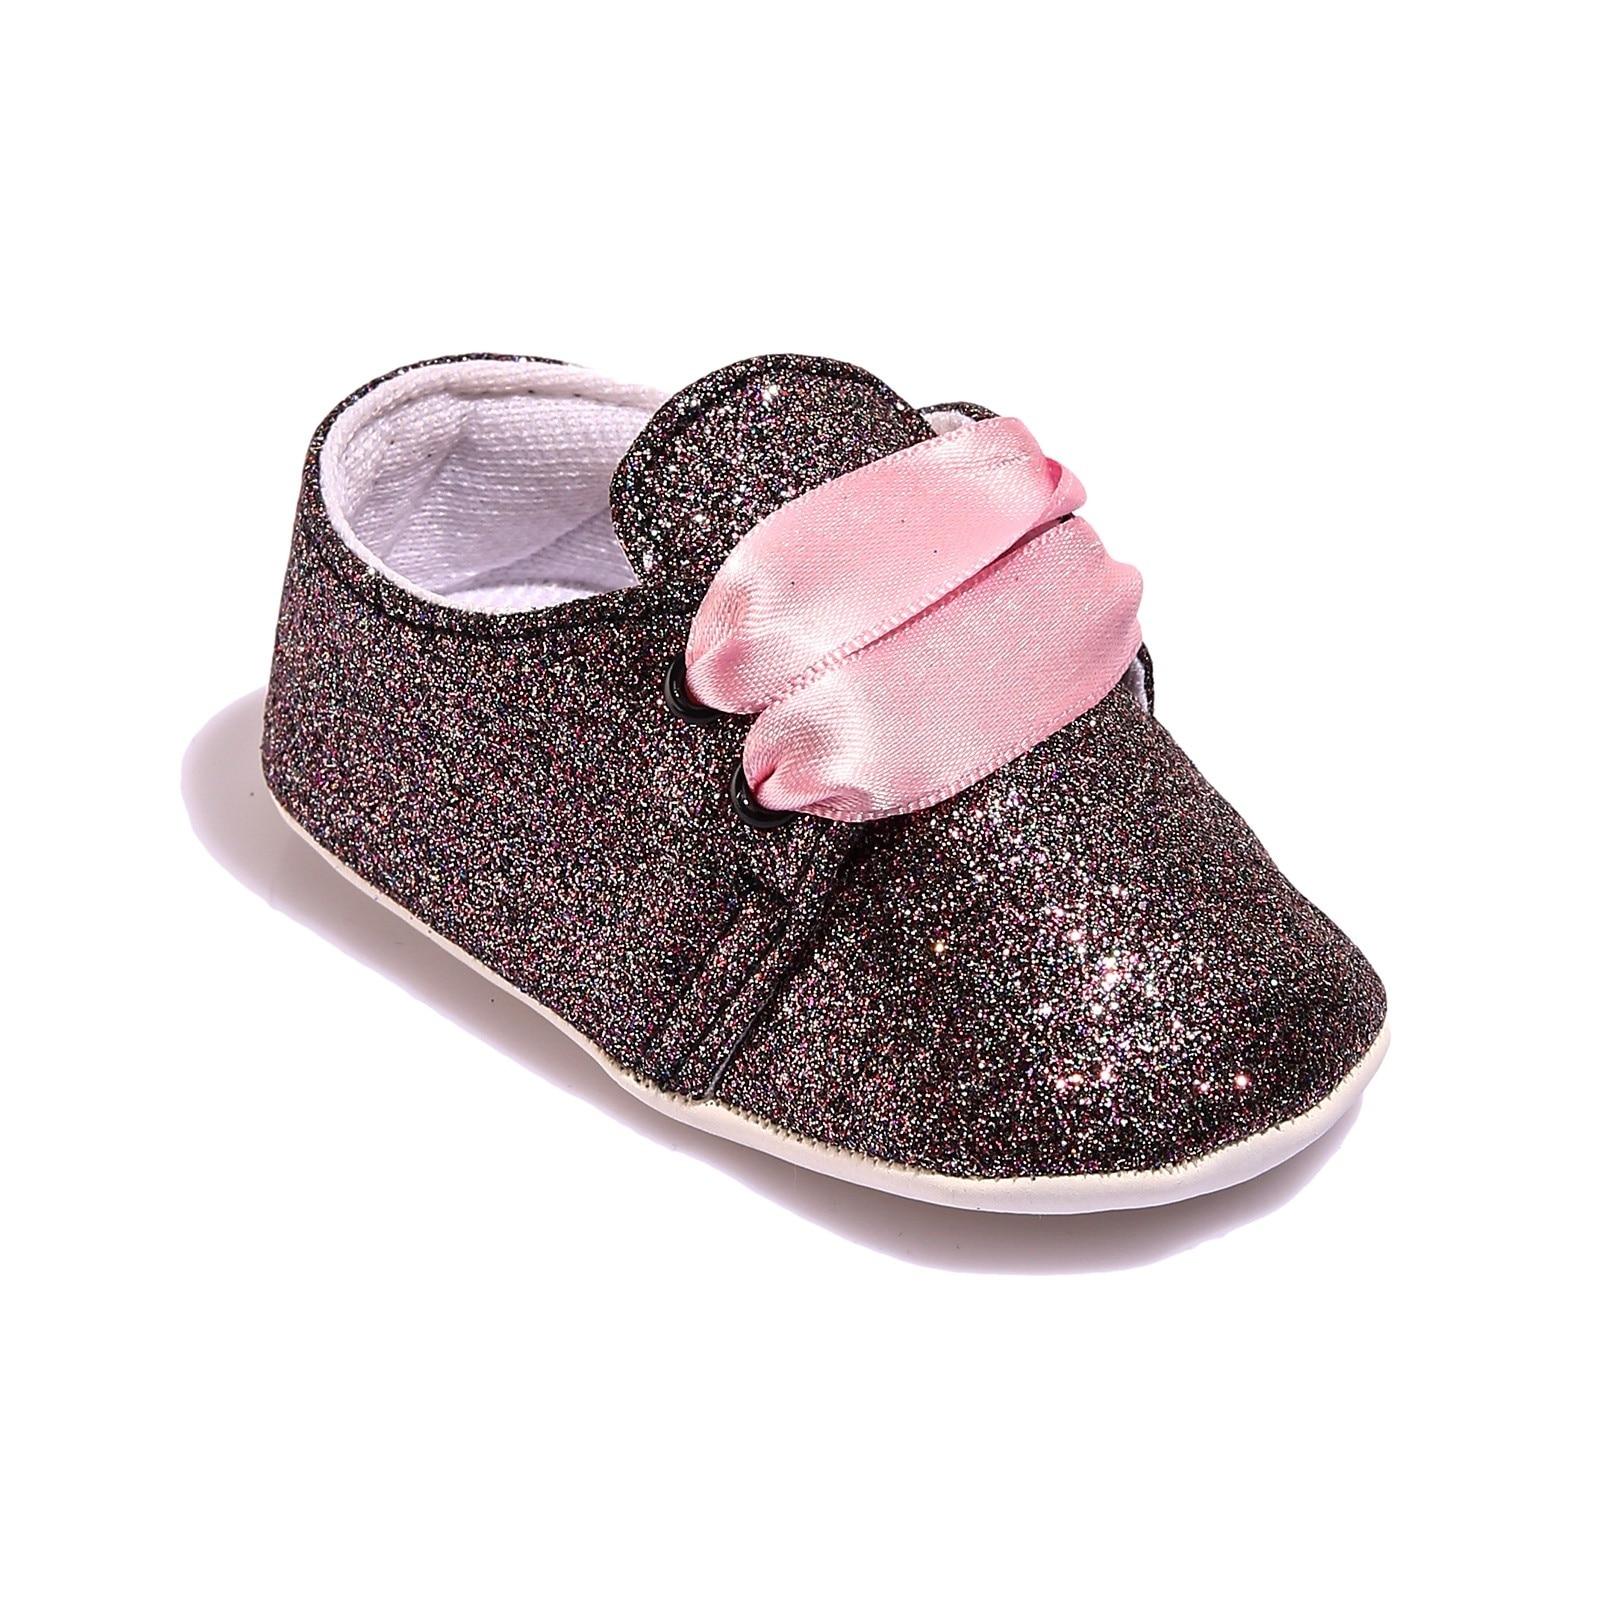 Ebebek Funny Patik Summer Baby Girl Shoes